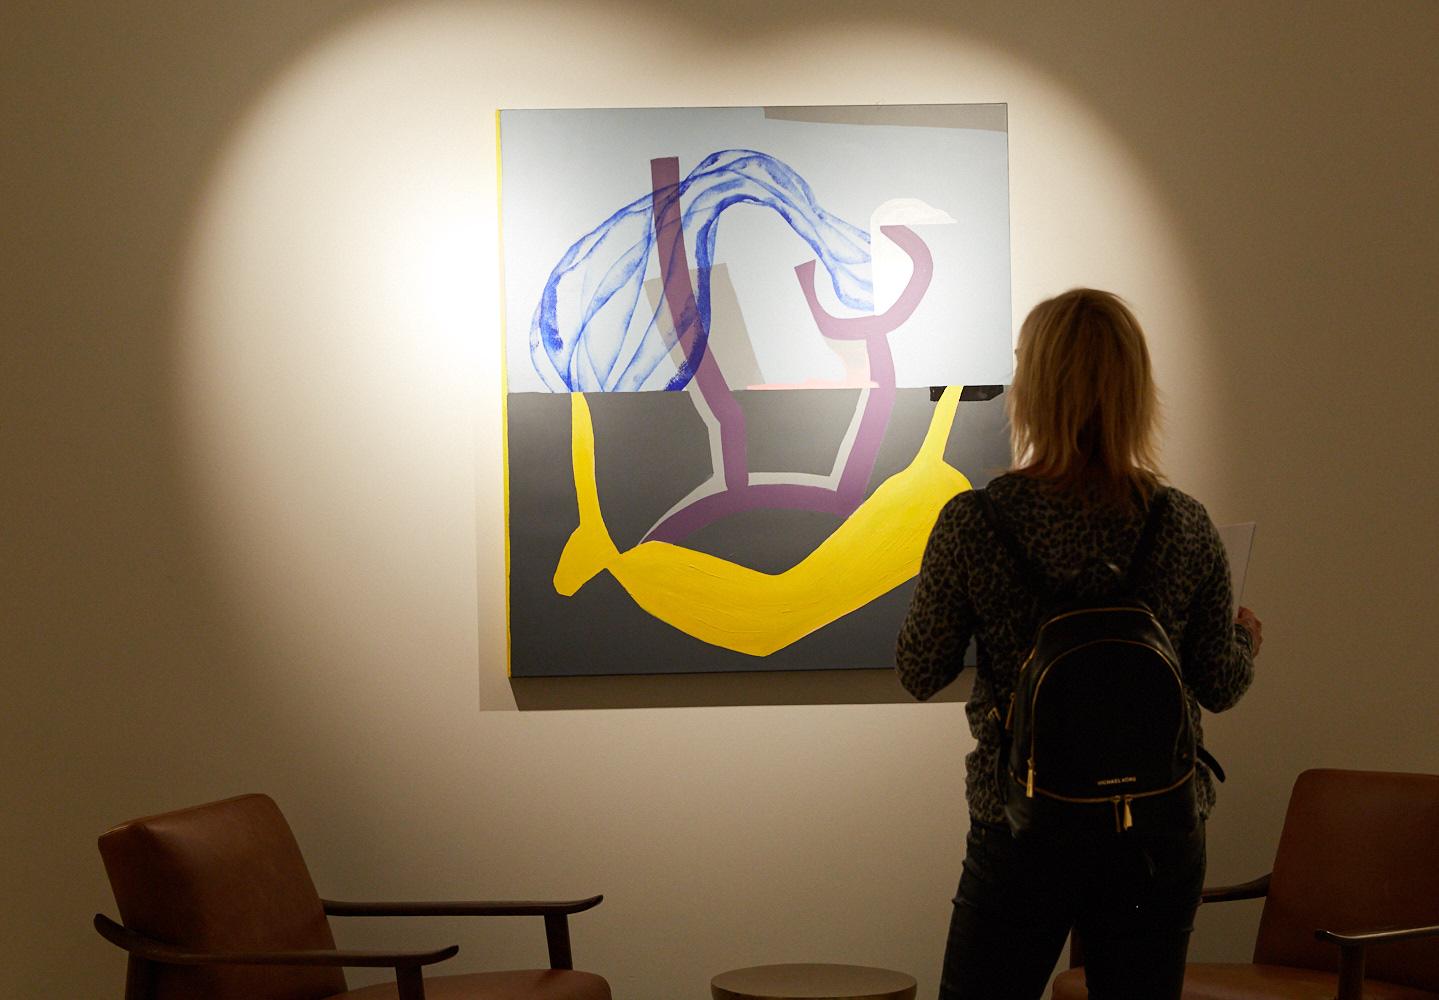 The_Yard_Coworking_Space-Olivia_Ramirez_Photography-Shony_Rivnay-Art_Opening 29.jpg